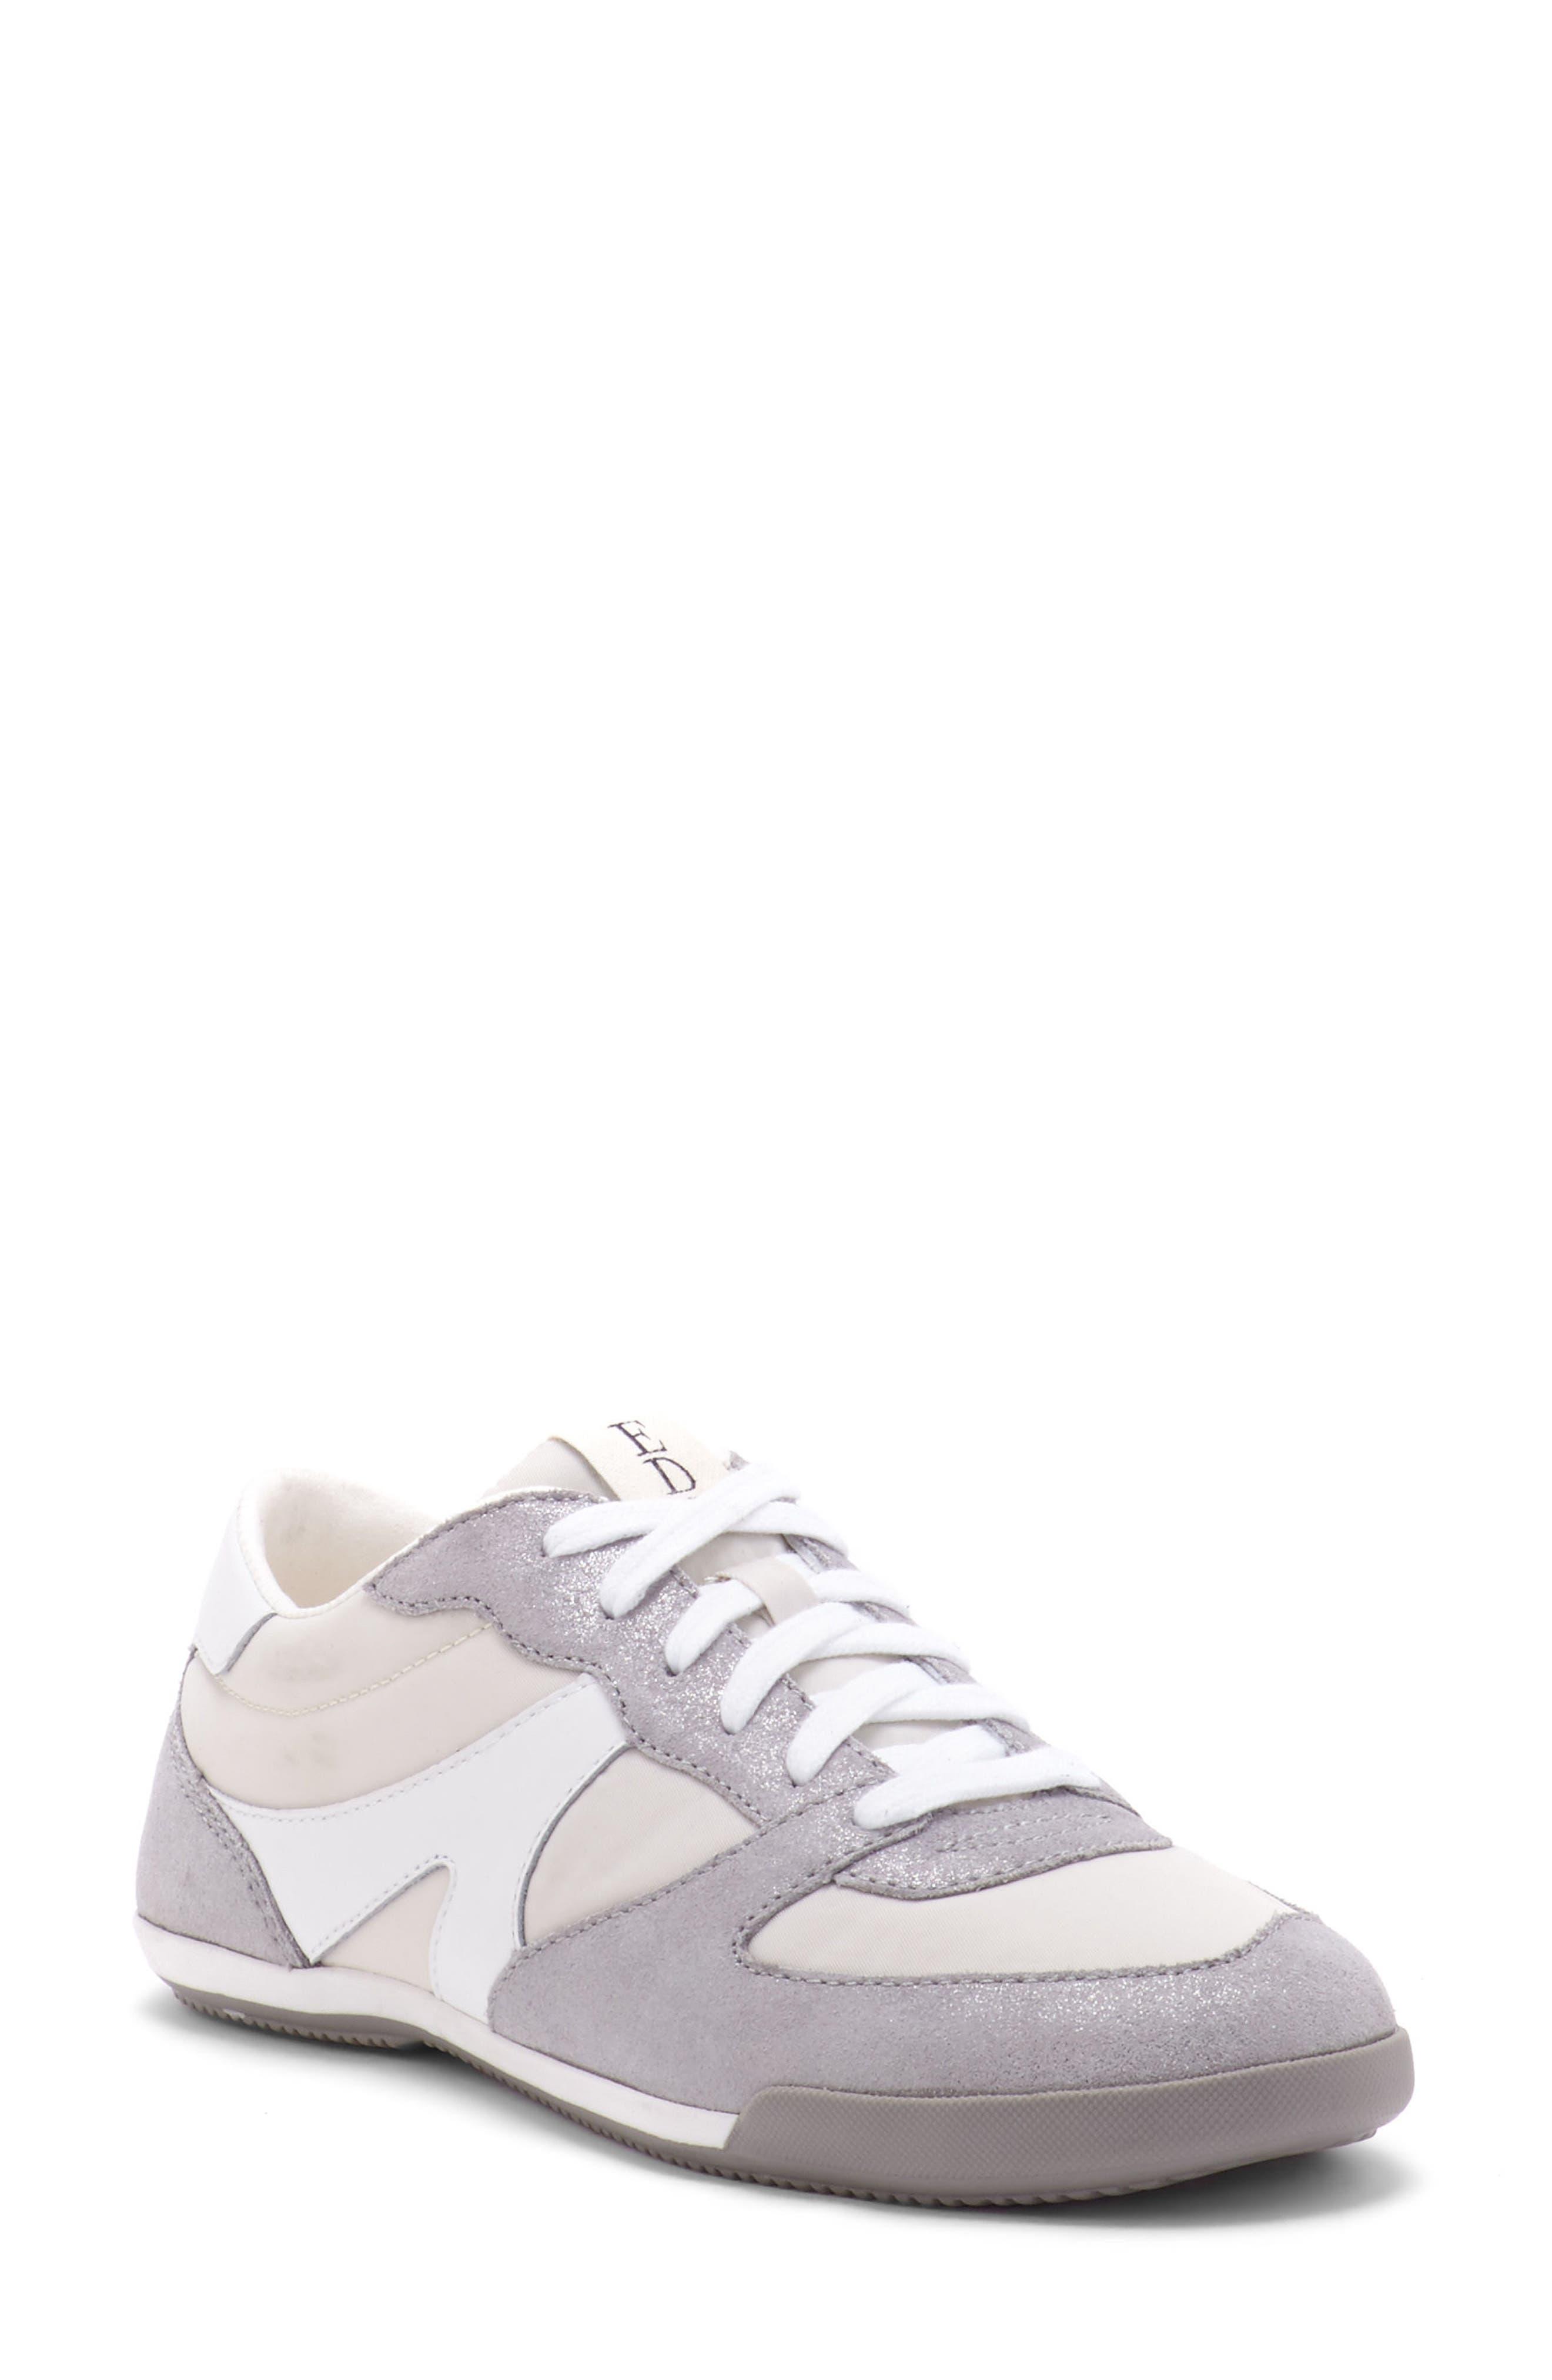 Ellert Sneaker,                             Main thumbnail 1, color,                             040